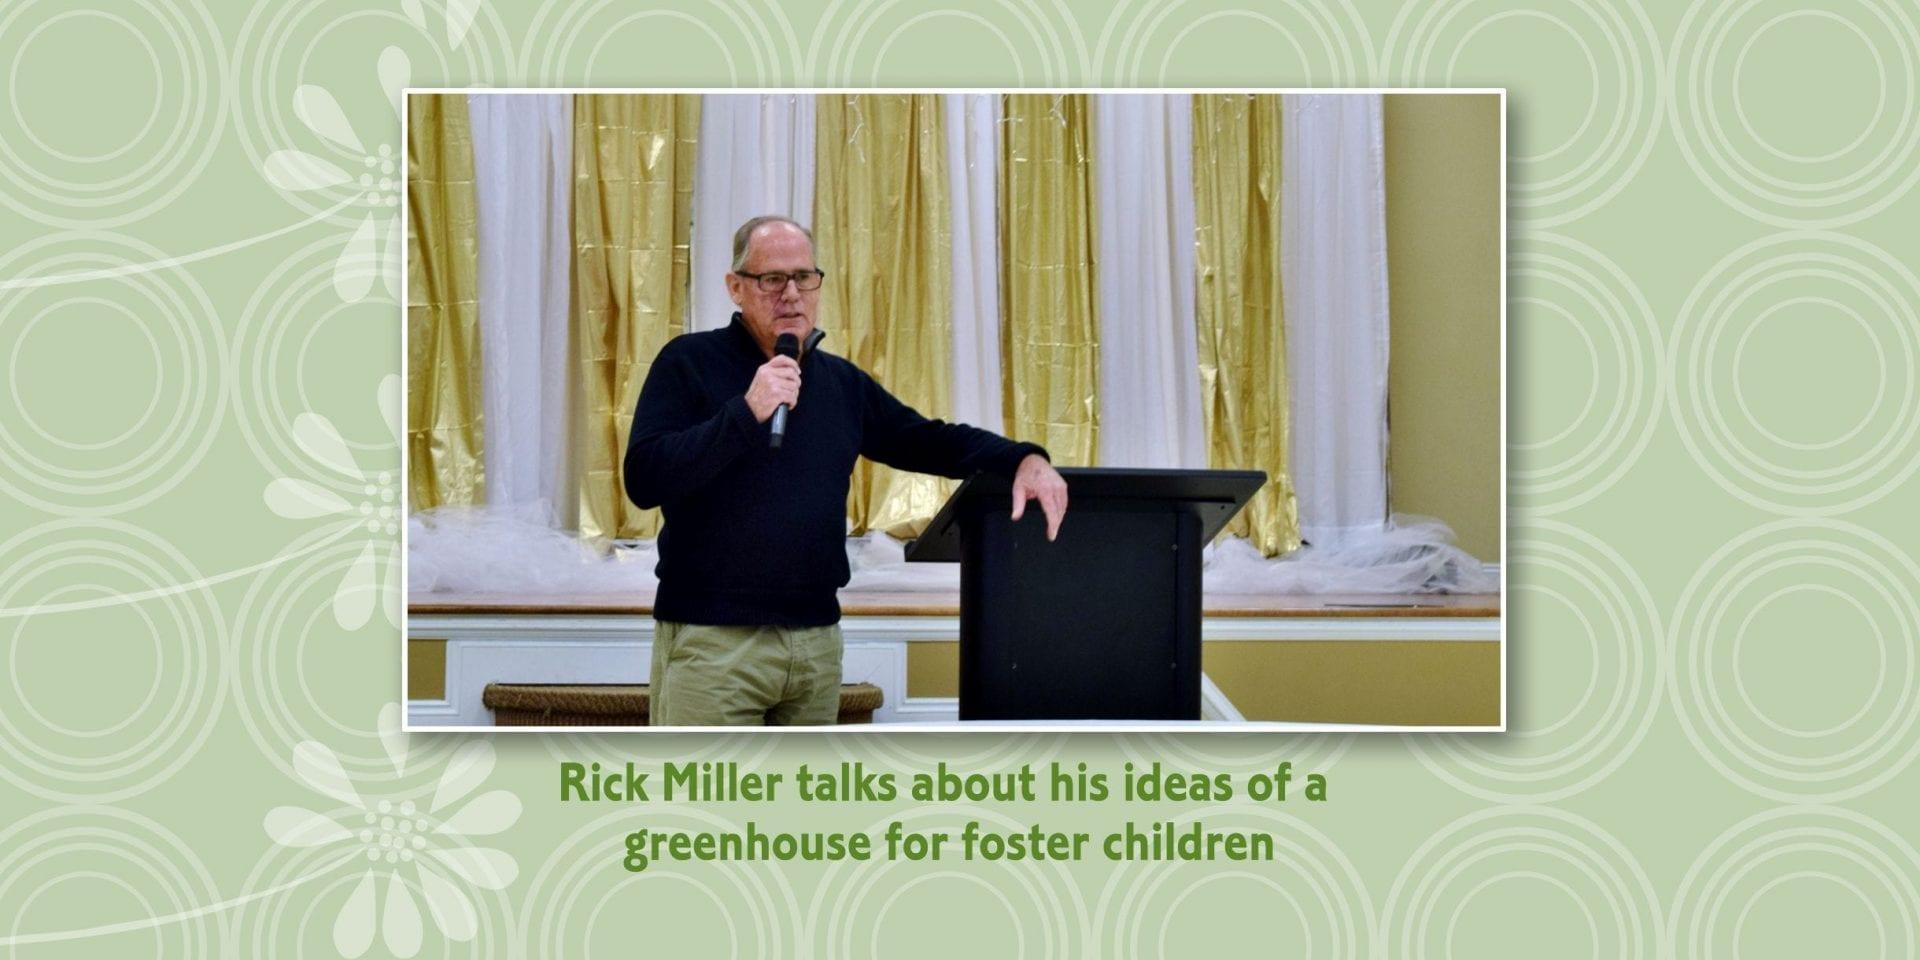 Rick Miller talking